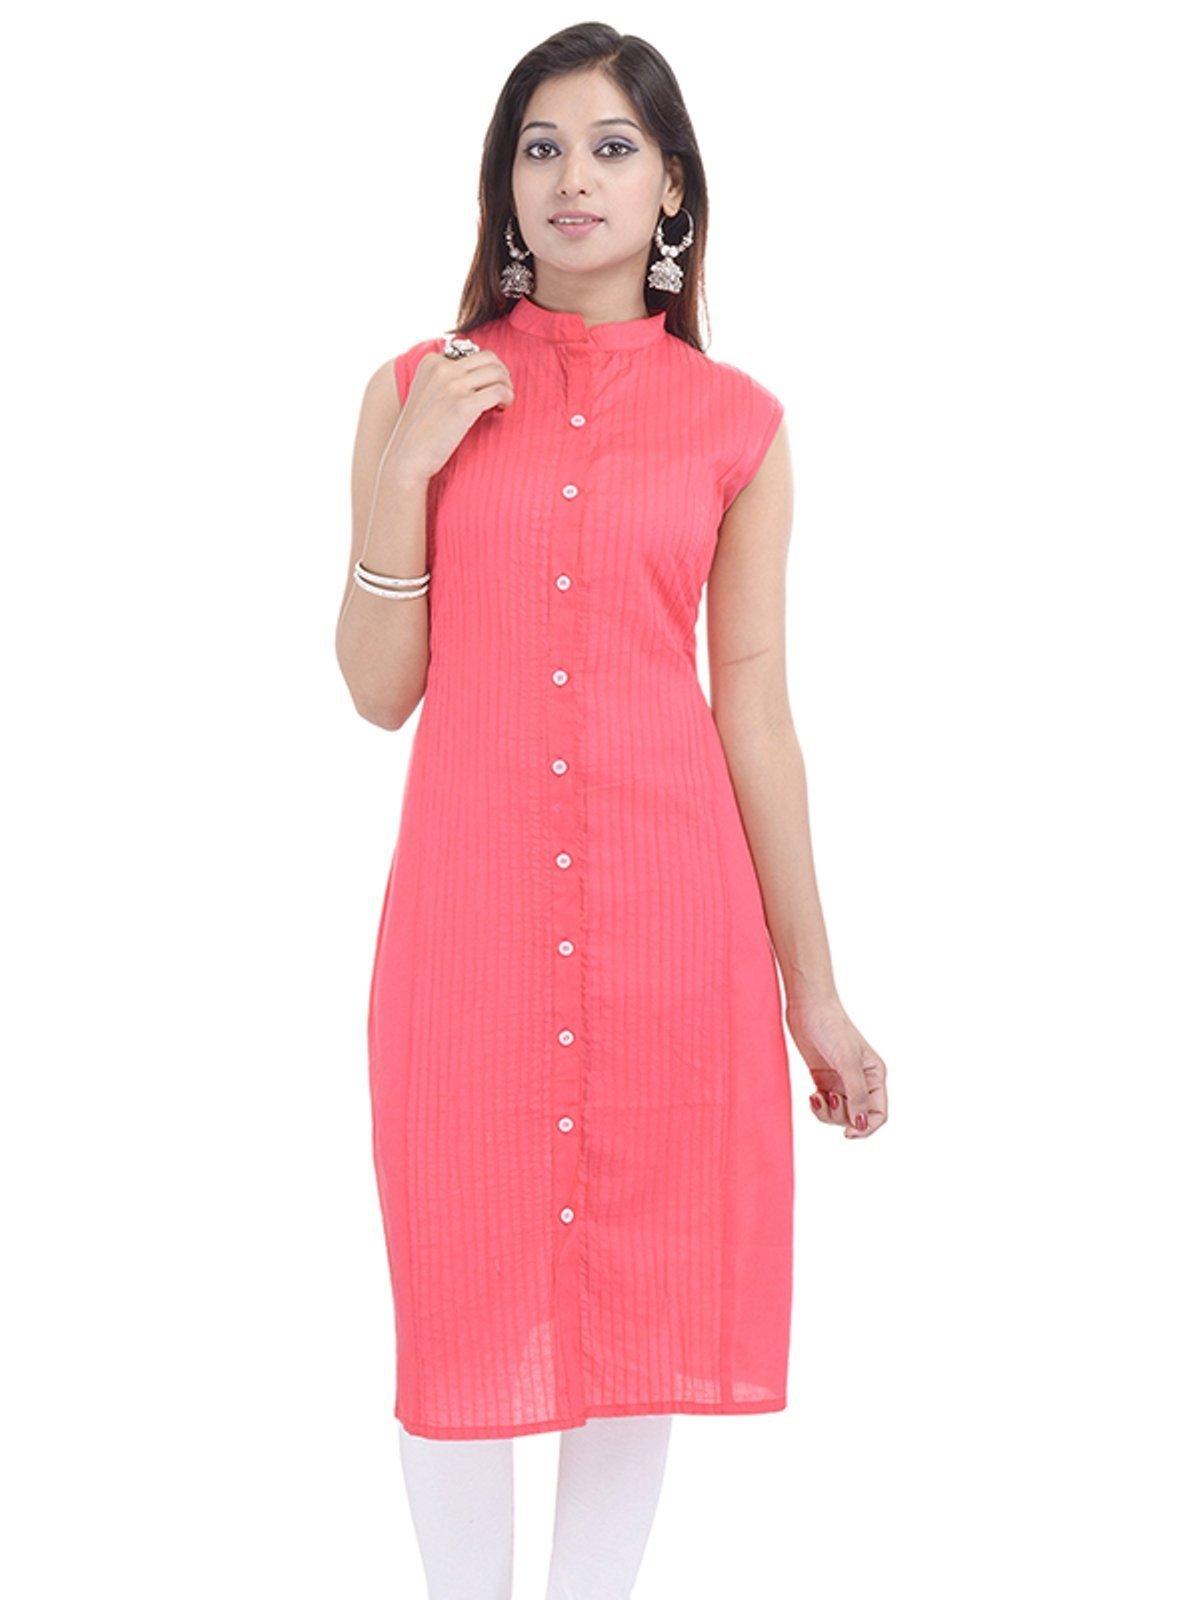 Chichi Indian Women Kurta Kurti Sleeve Less Medium Size Plain Straight Aboli Top